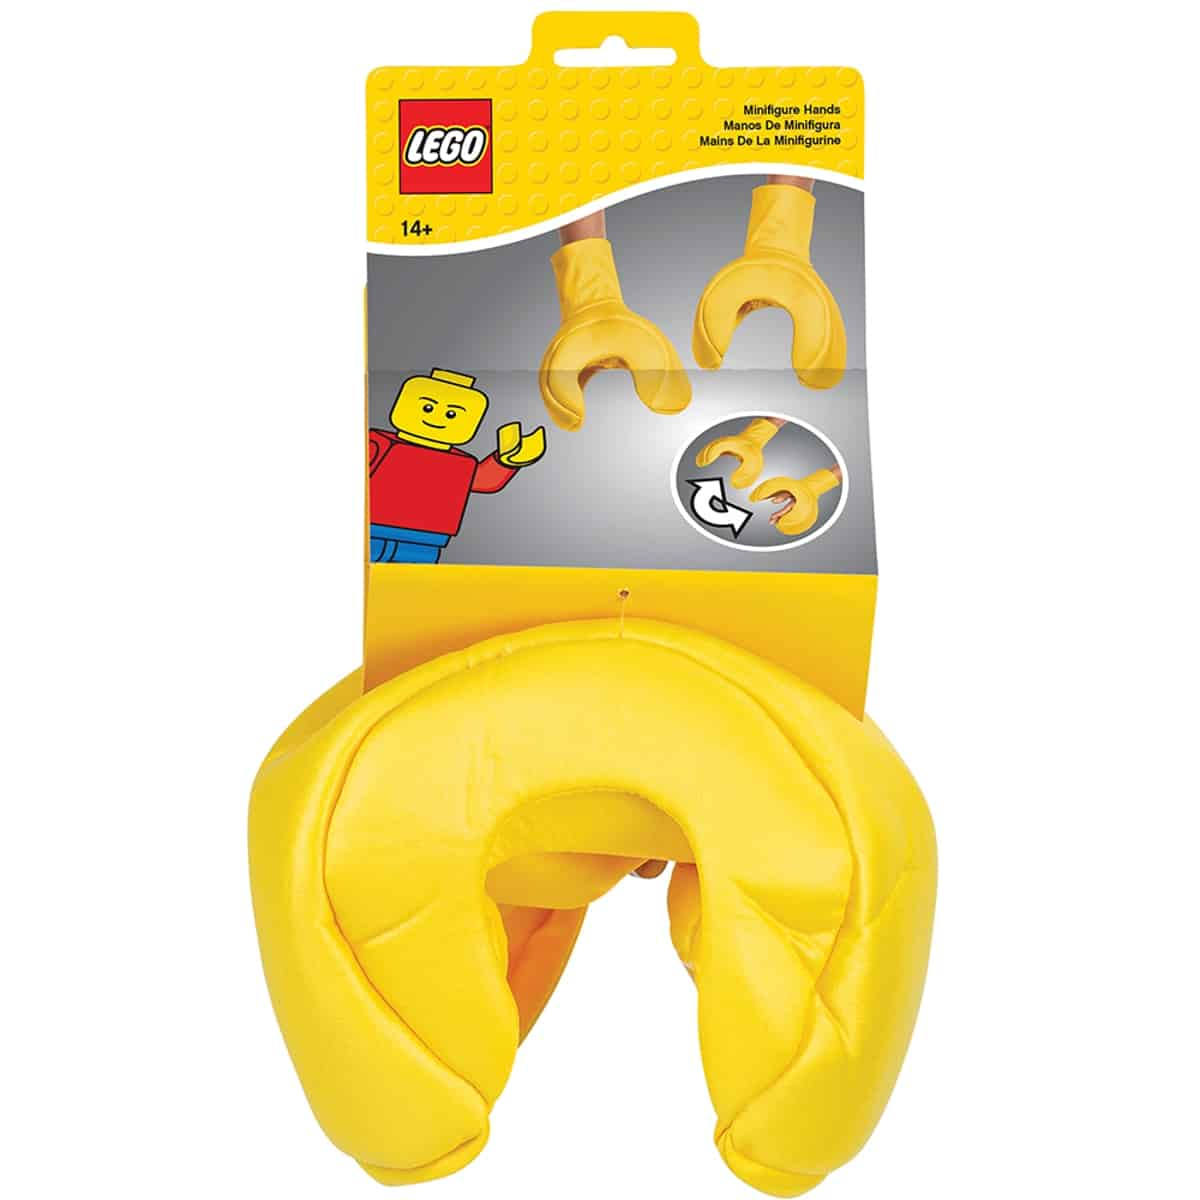 lego 5006975 adult hands yellow